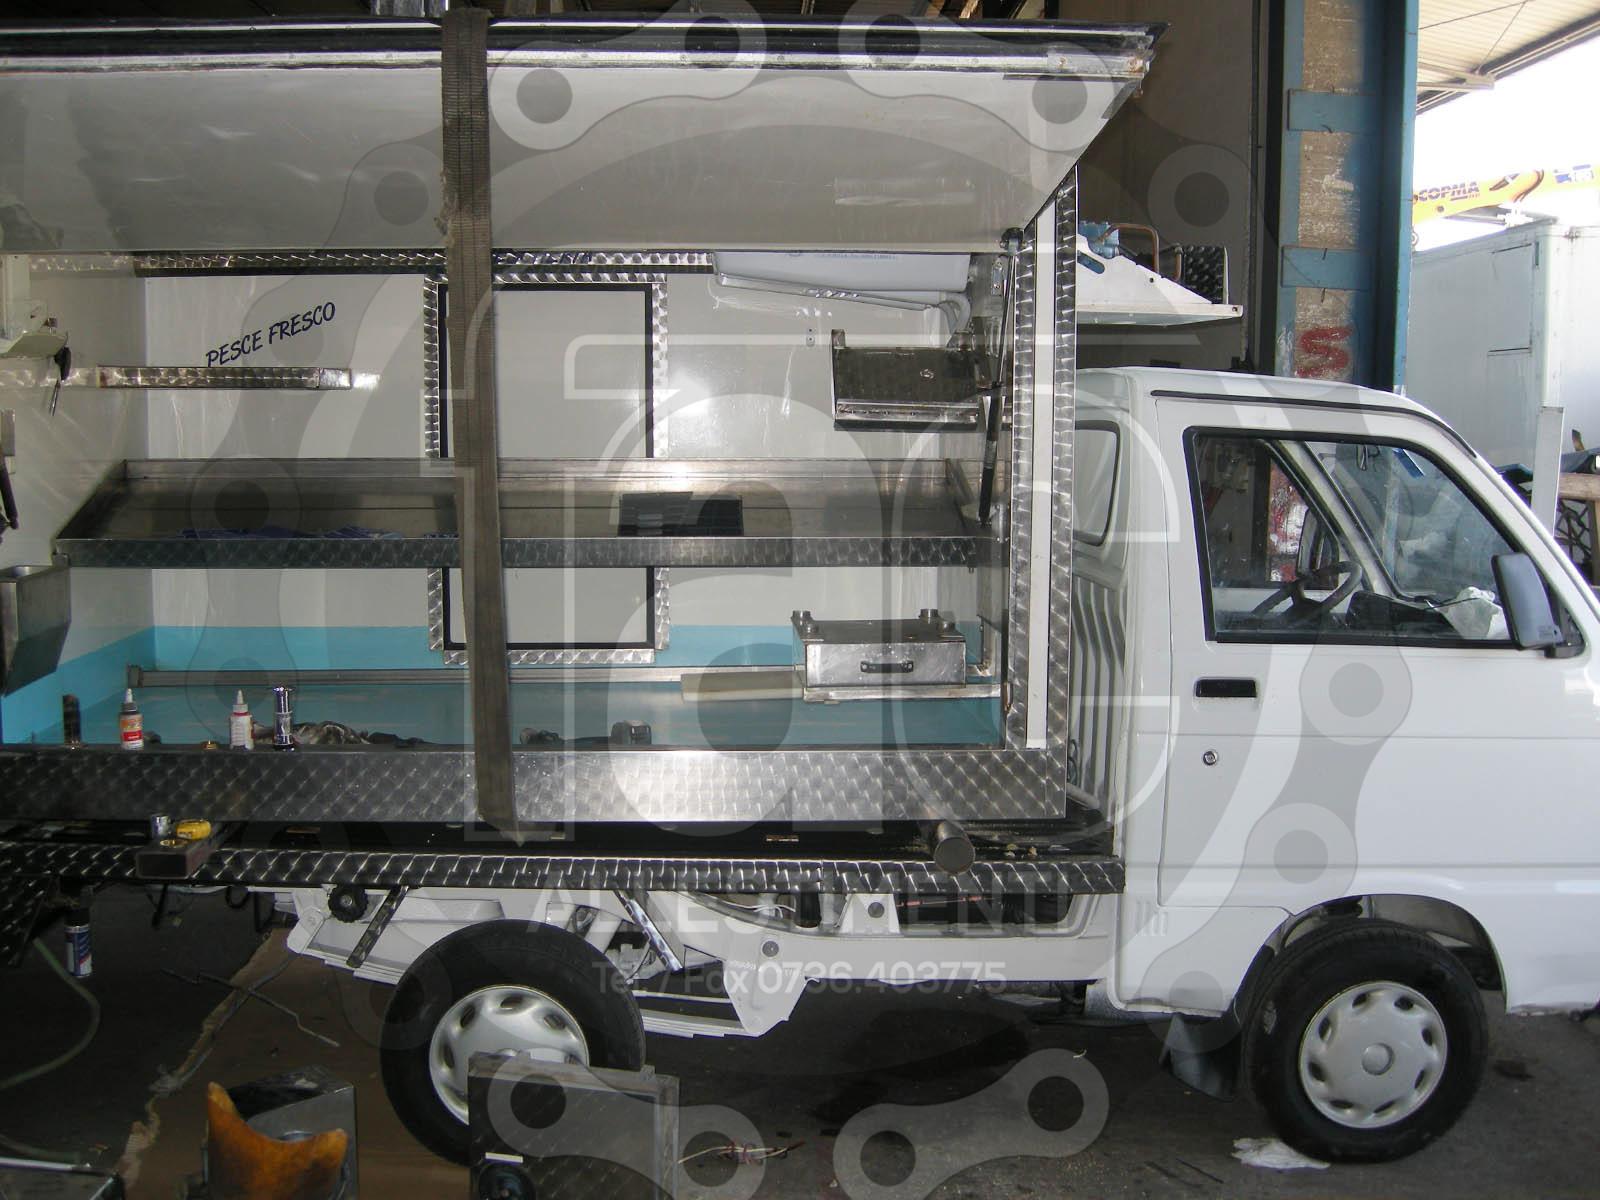 Gallery Pescheria mobile